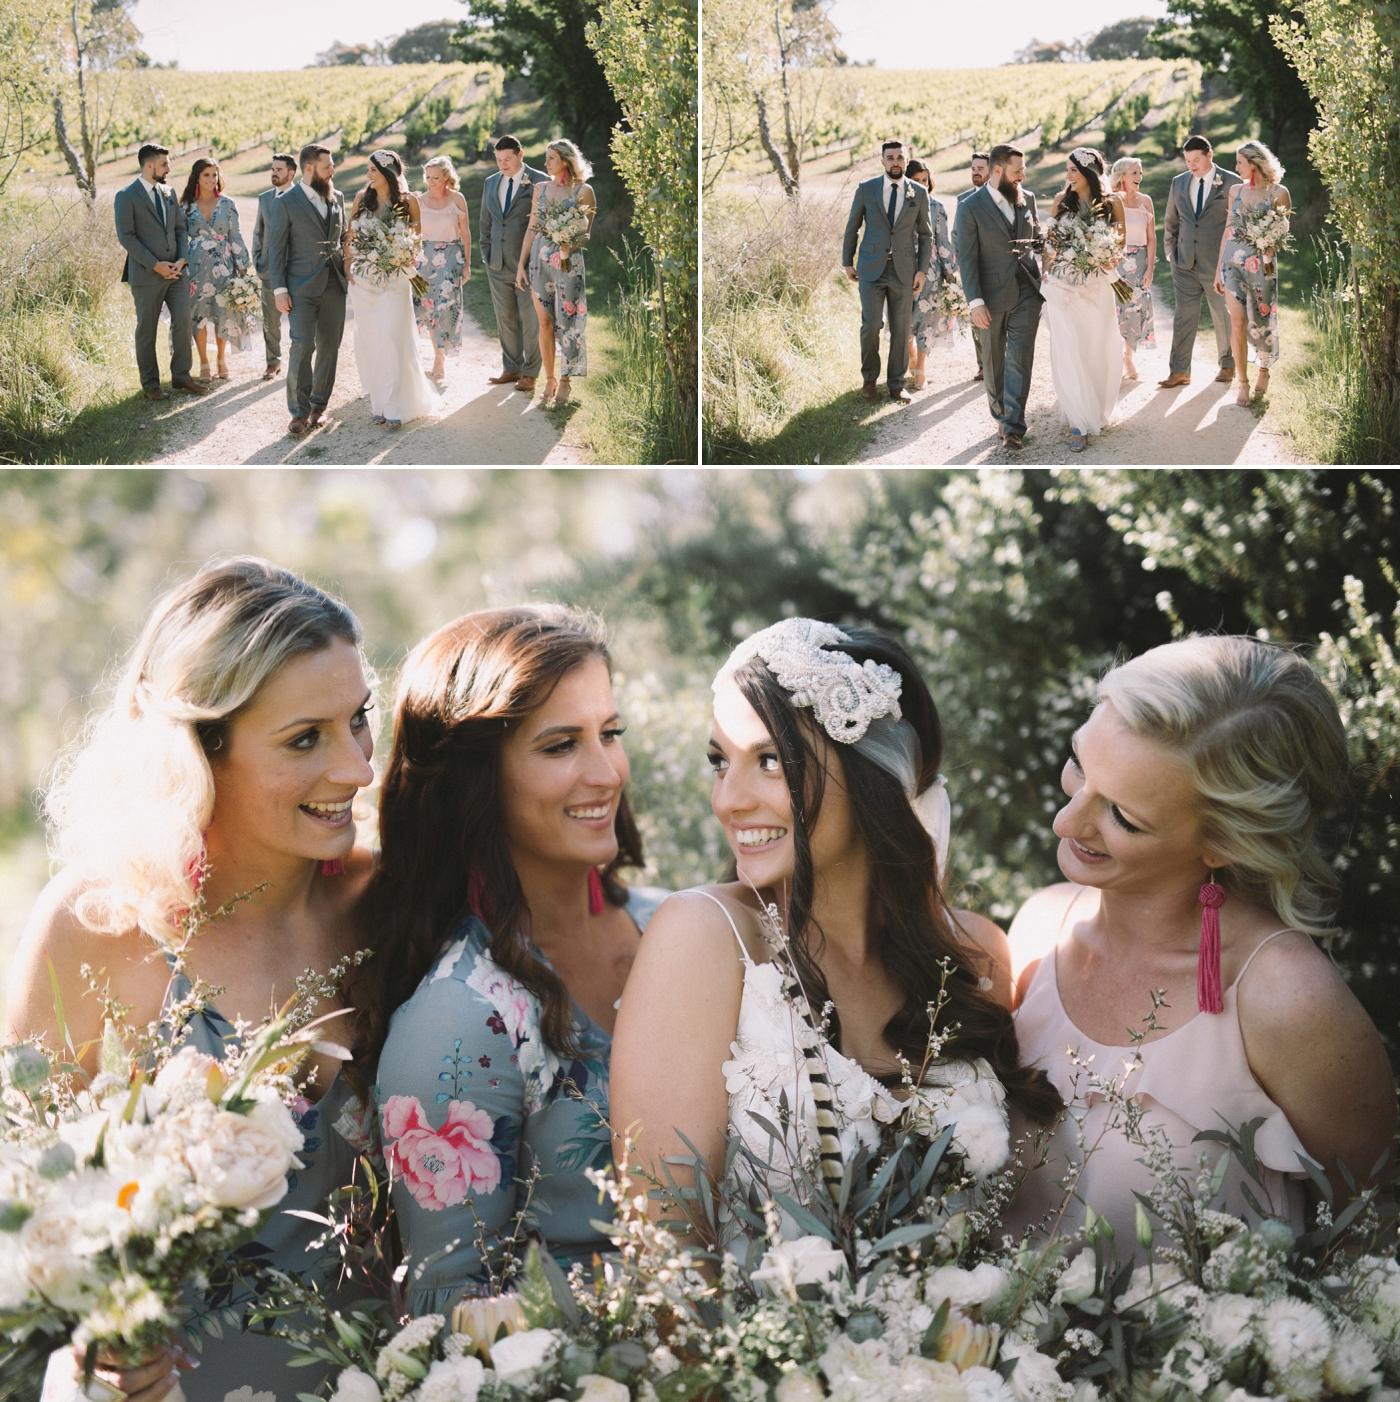 Maddy & Wes - K1 by Geoff Hardy Wedding - Adelaide Wedding Photographer - Natural wedding photography in Adelaide - Katherine Schultz_0040.jpg